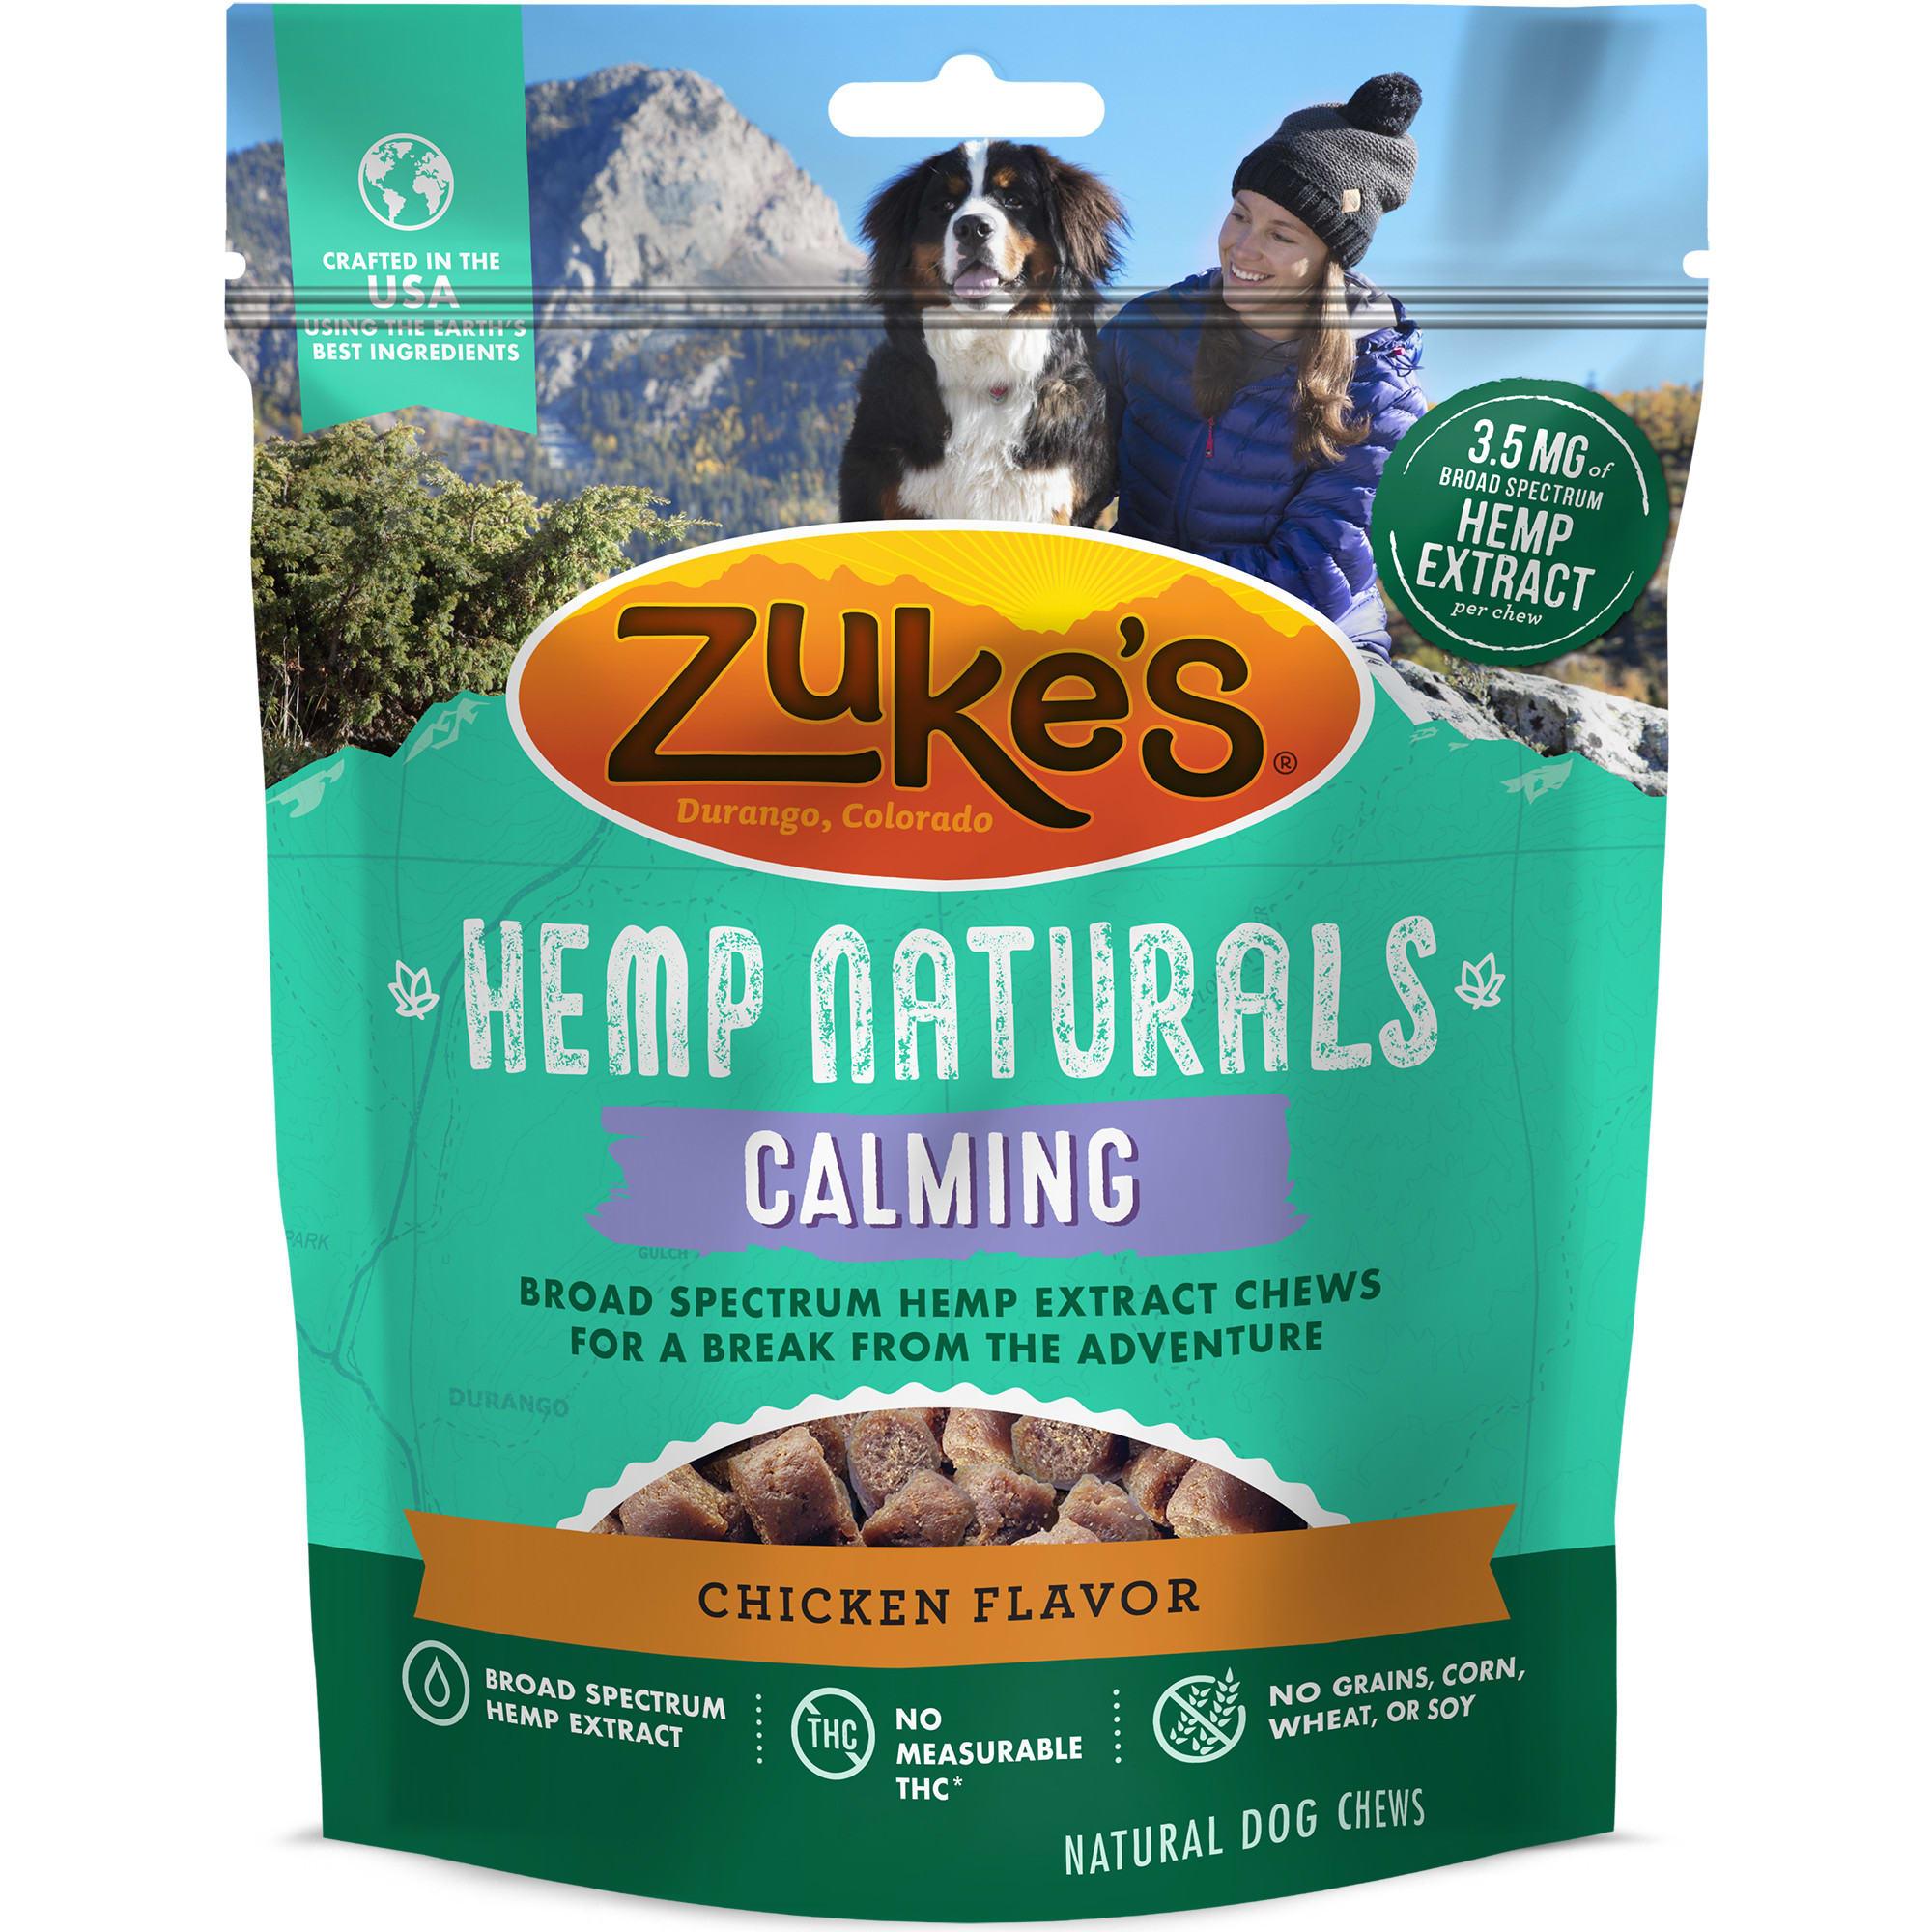 Image of Zuke's Hemp Naturals Calming Chicken Formula Dog Treats